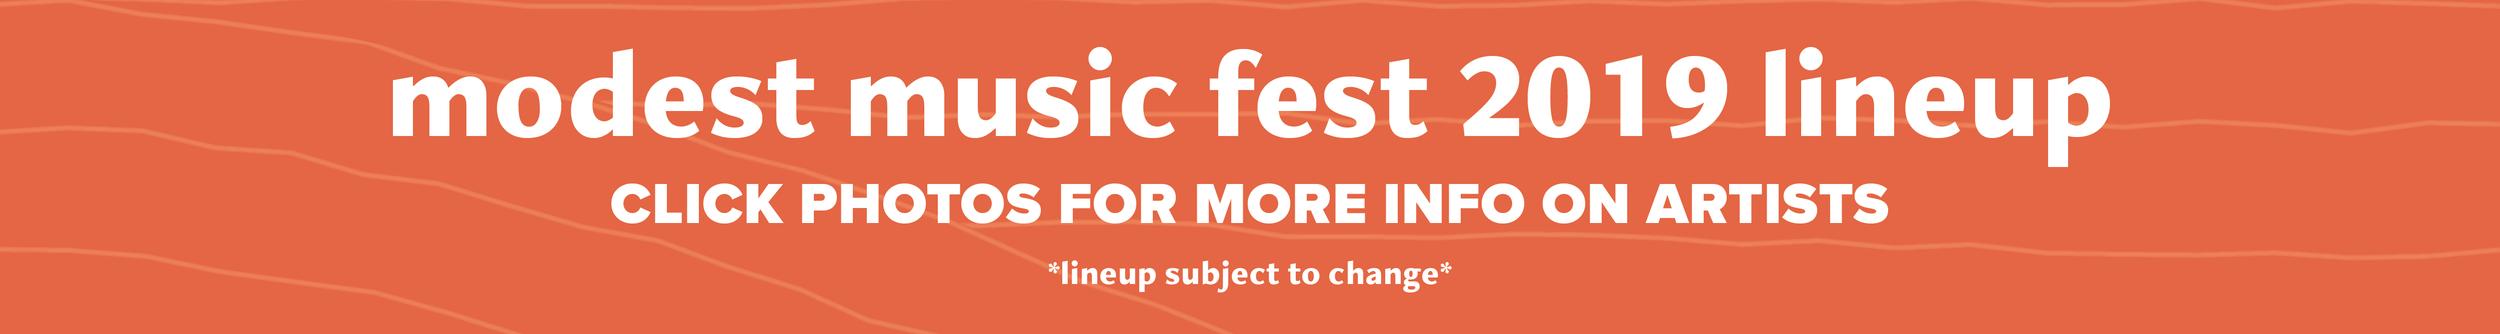 Modest Music Fest 2019 Lineup-07.png